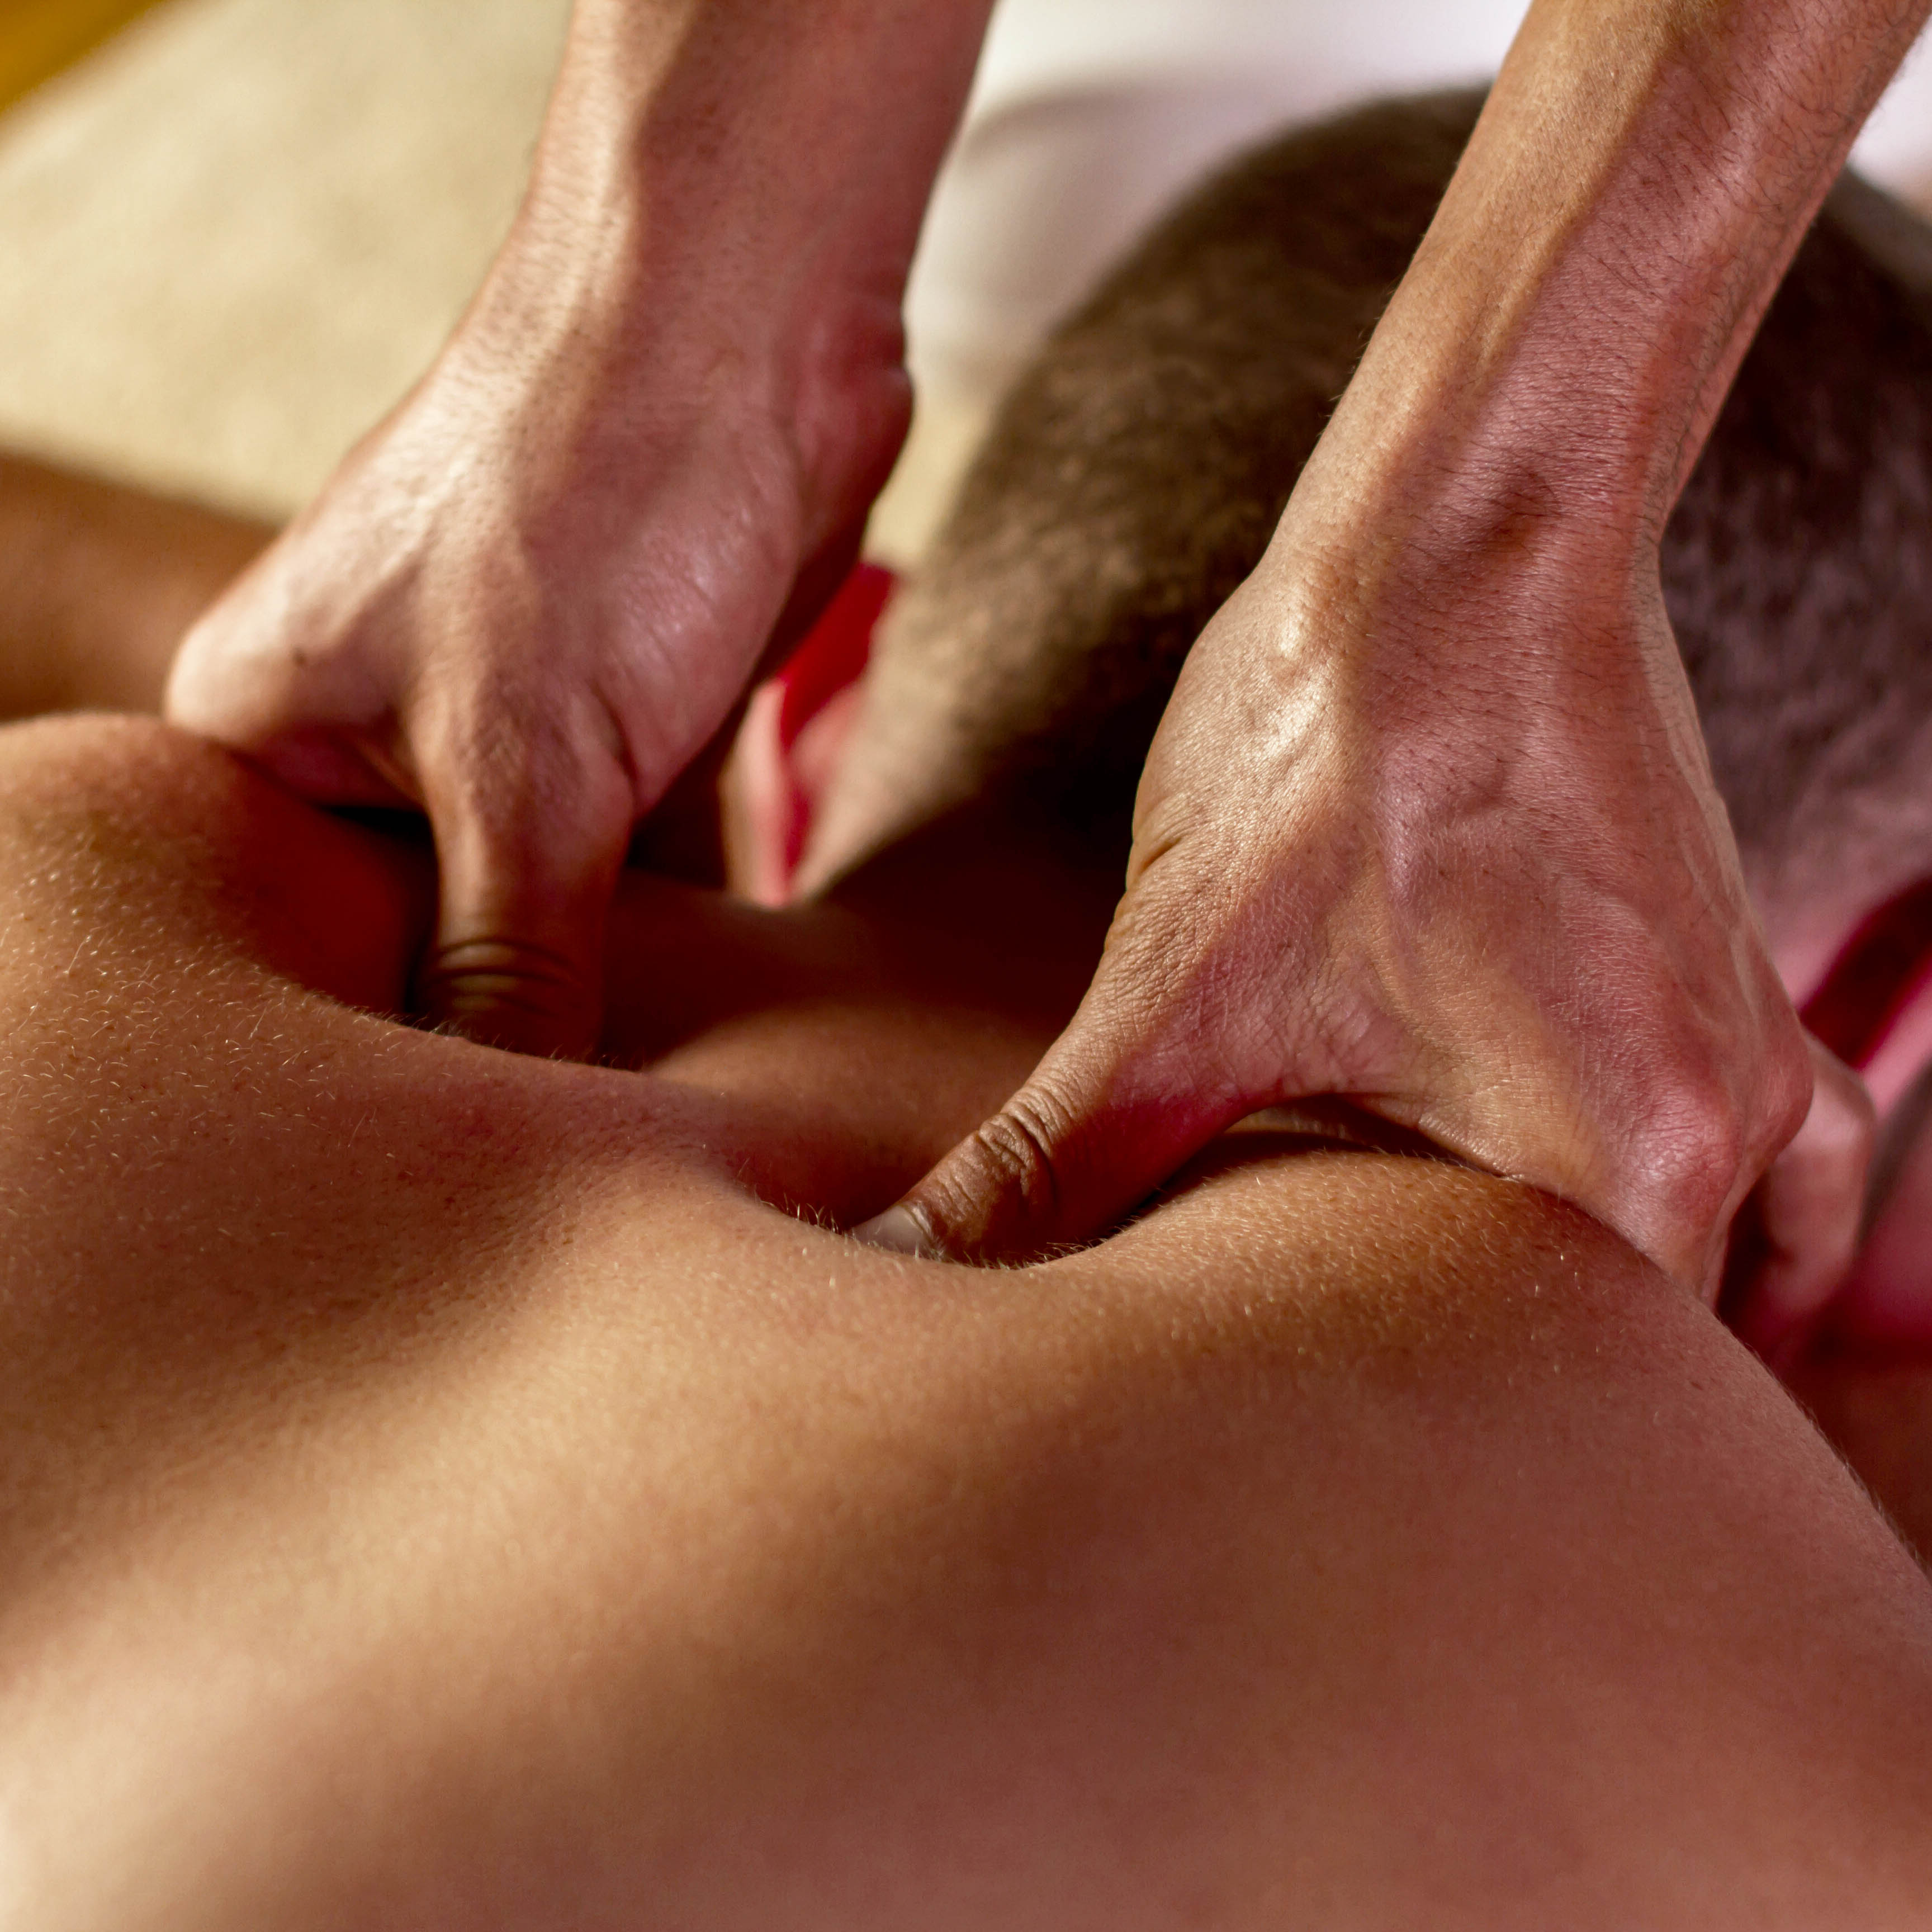 massage_ThinkstockPhotos